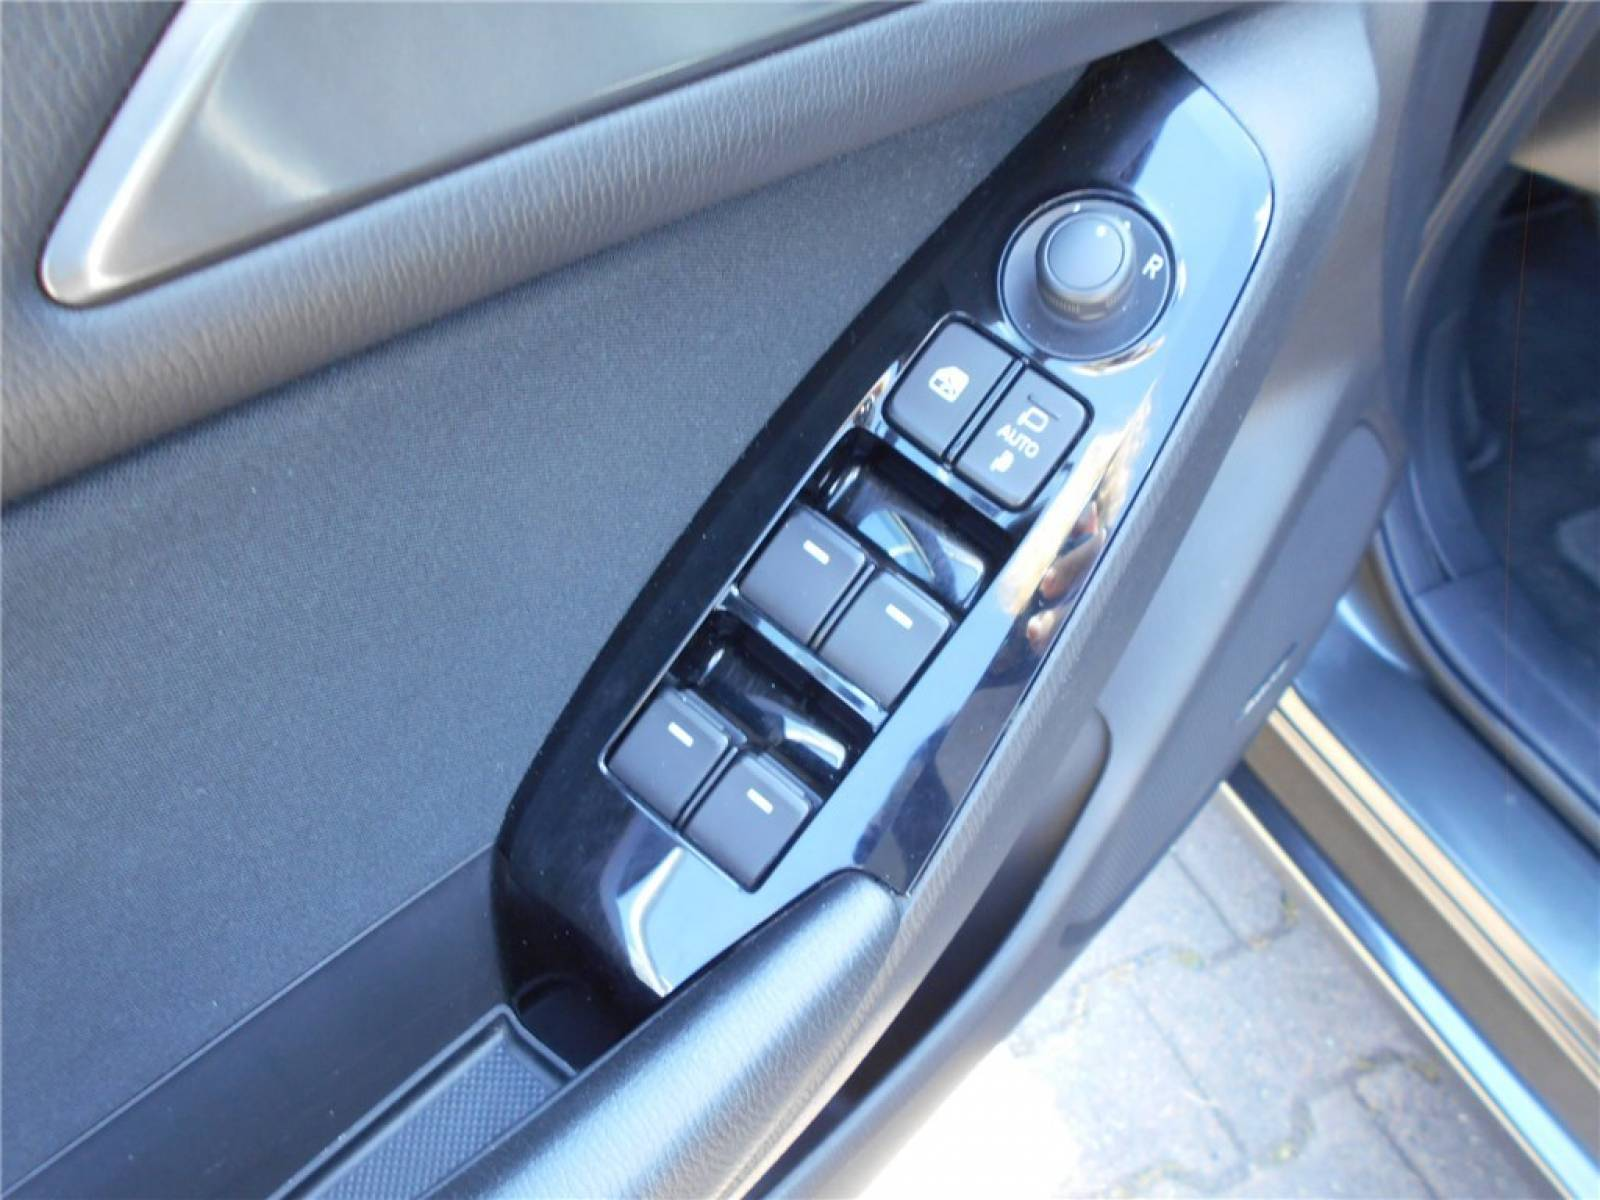 MAZDA Mazda3 2.2L SKYACTIV-D 150ch - véhicule d'occasion - Groupe Guillet - Chalon Automobiles - 71100 - Chalon-sur-Saône - 11